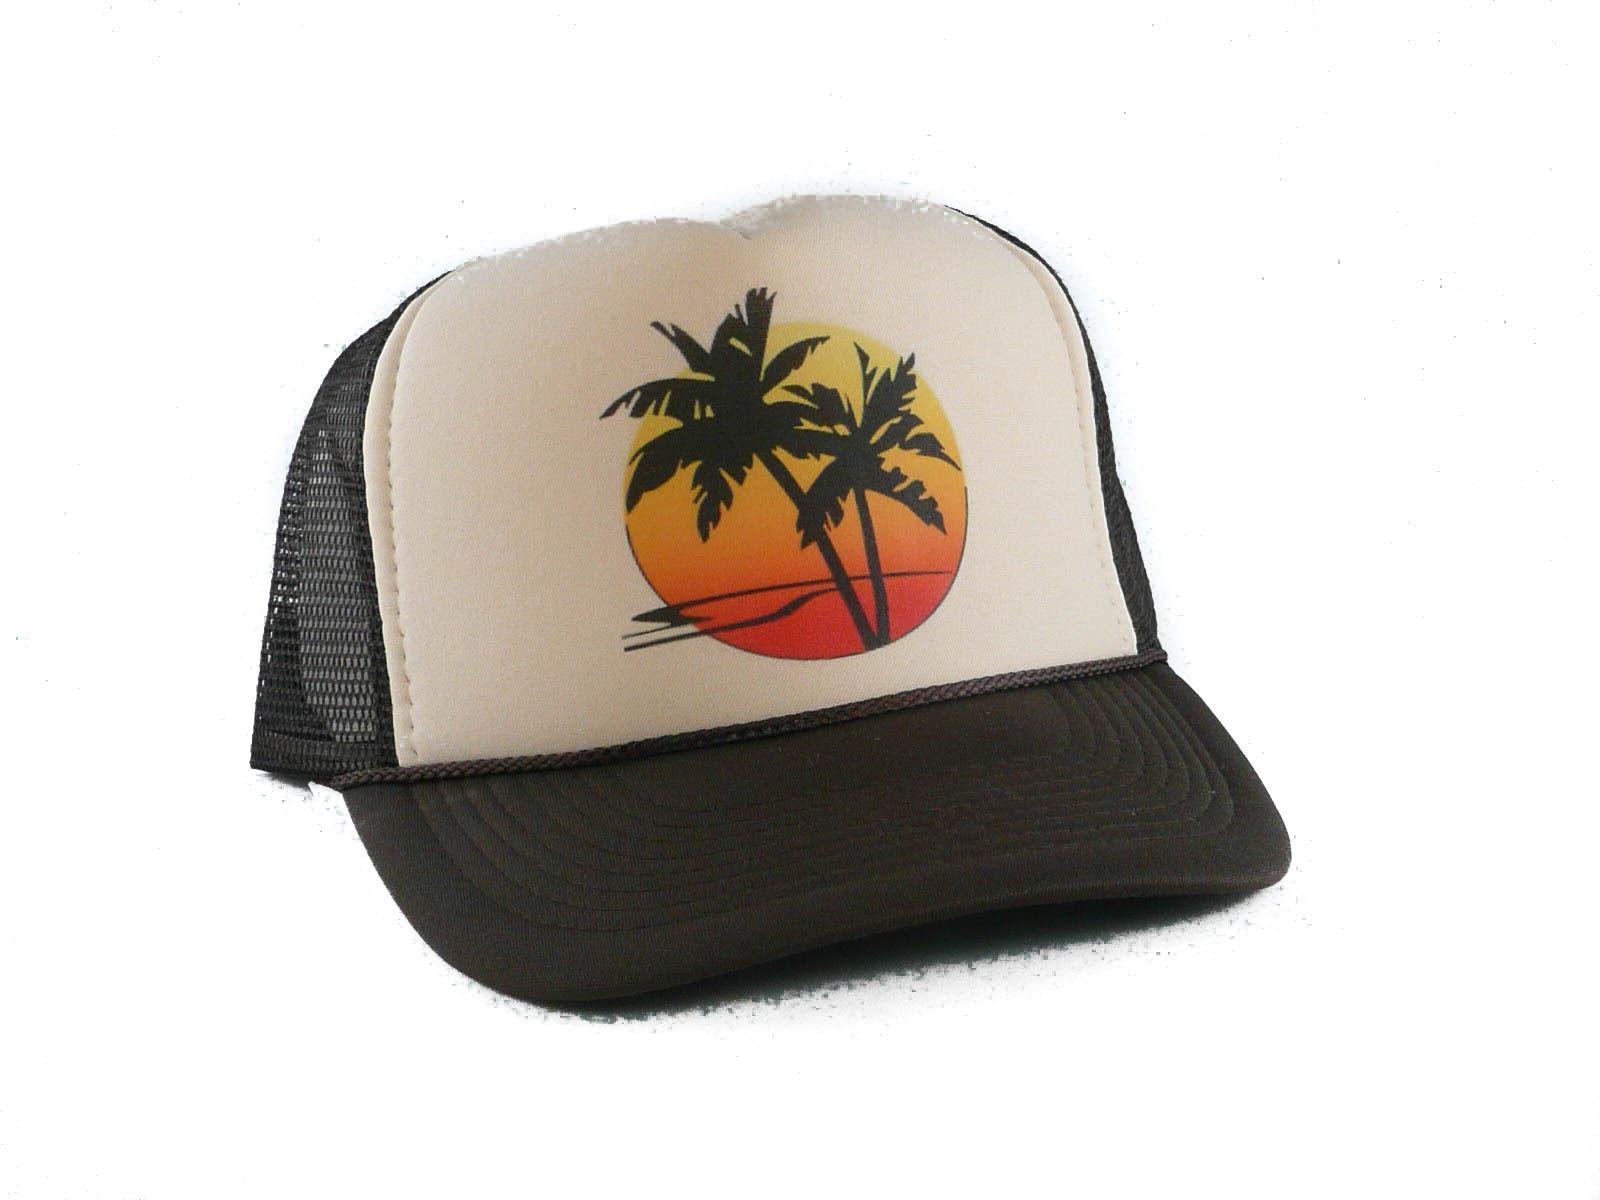 NEW Sunset Palm Trucker Hat mesh hat snapback hat tan brown